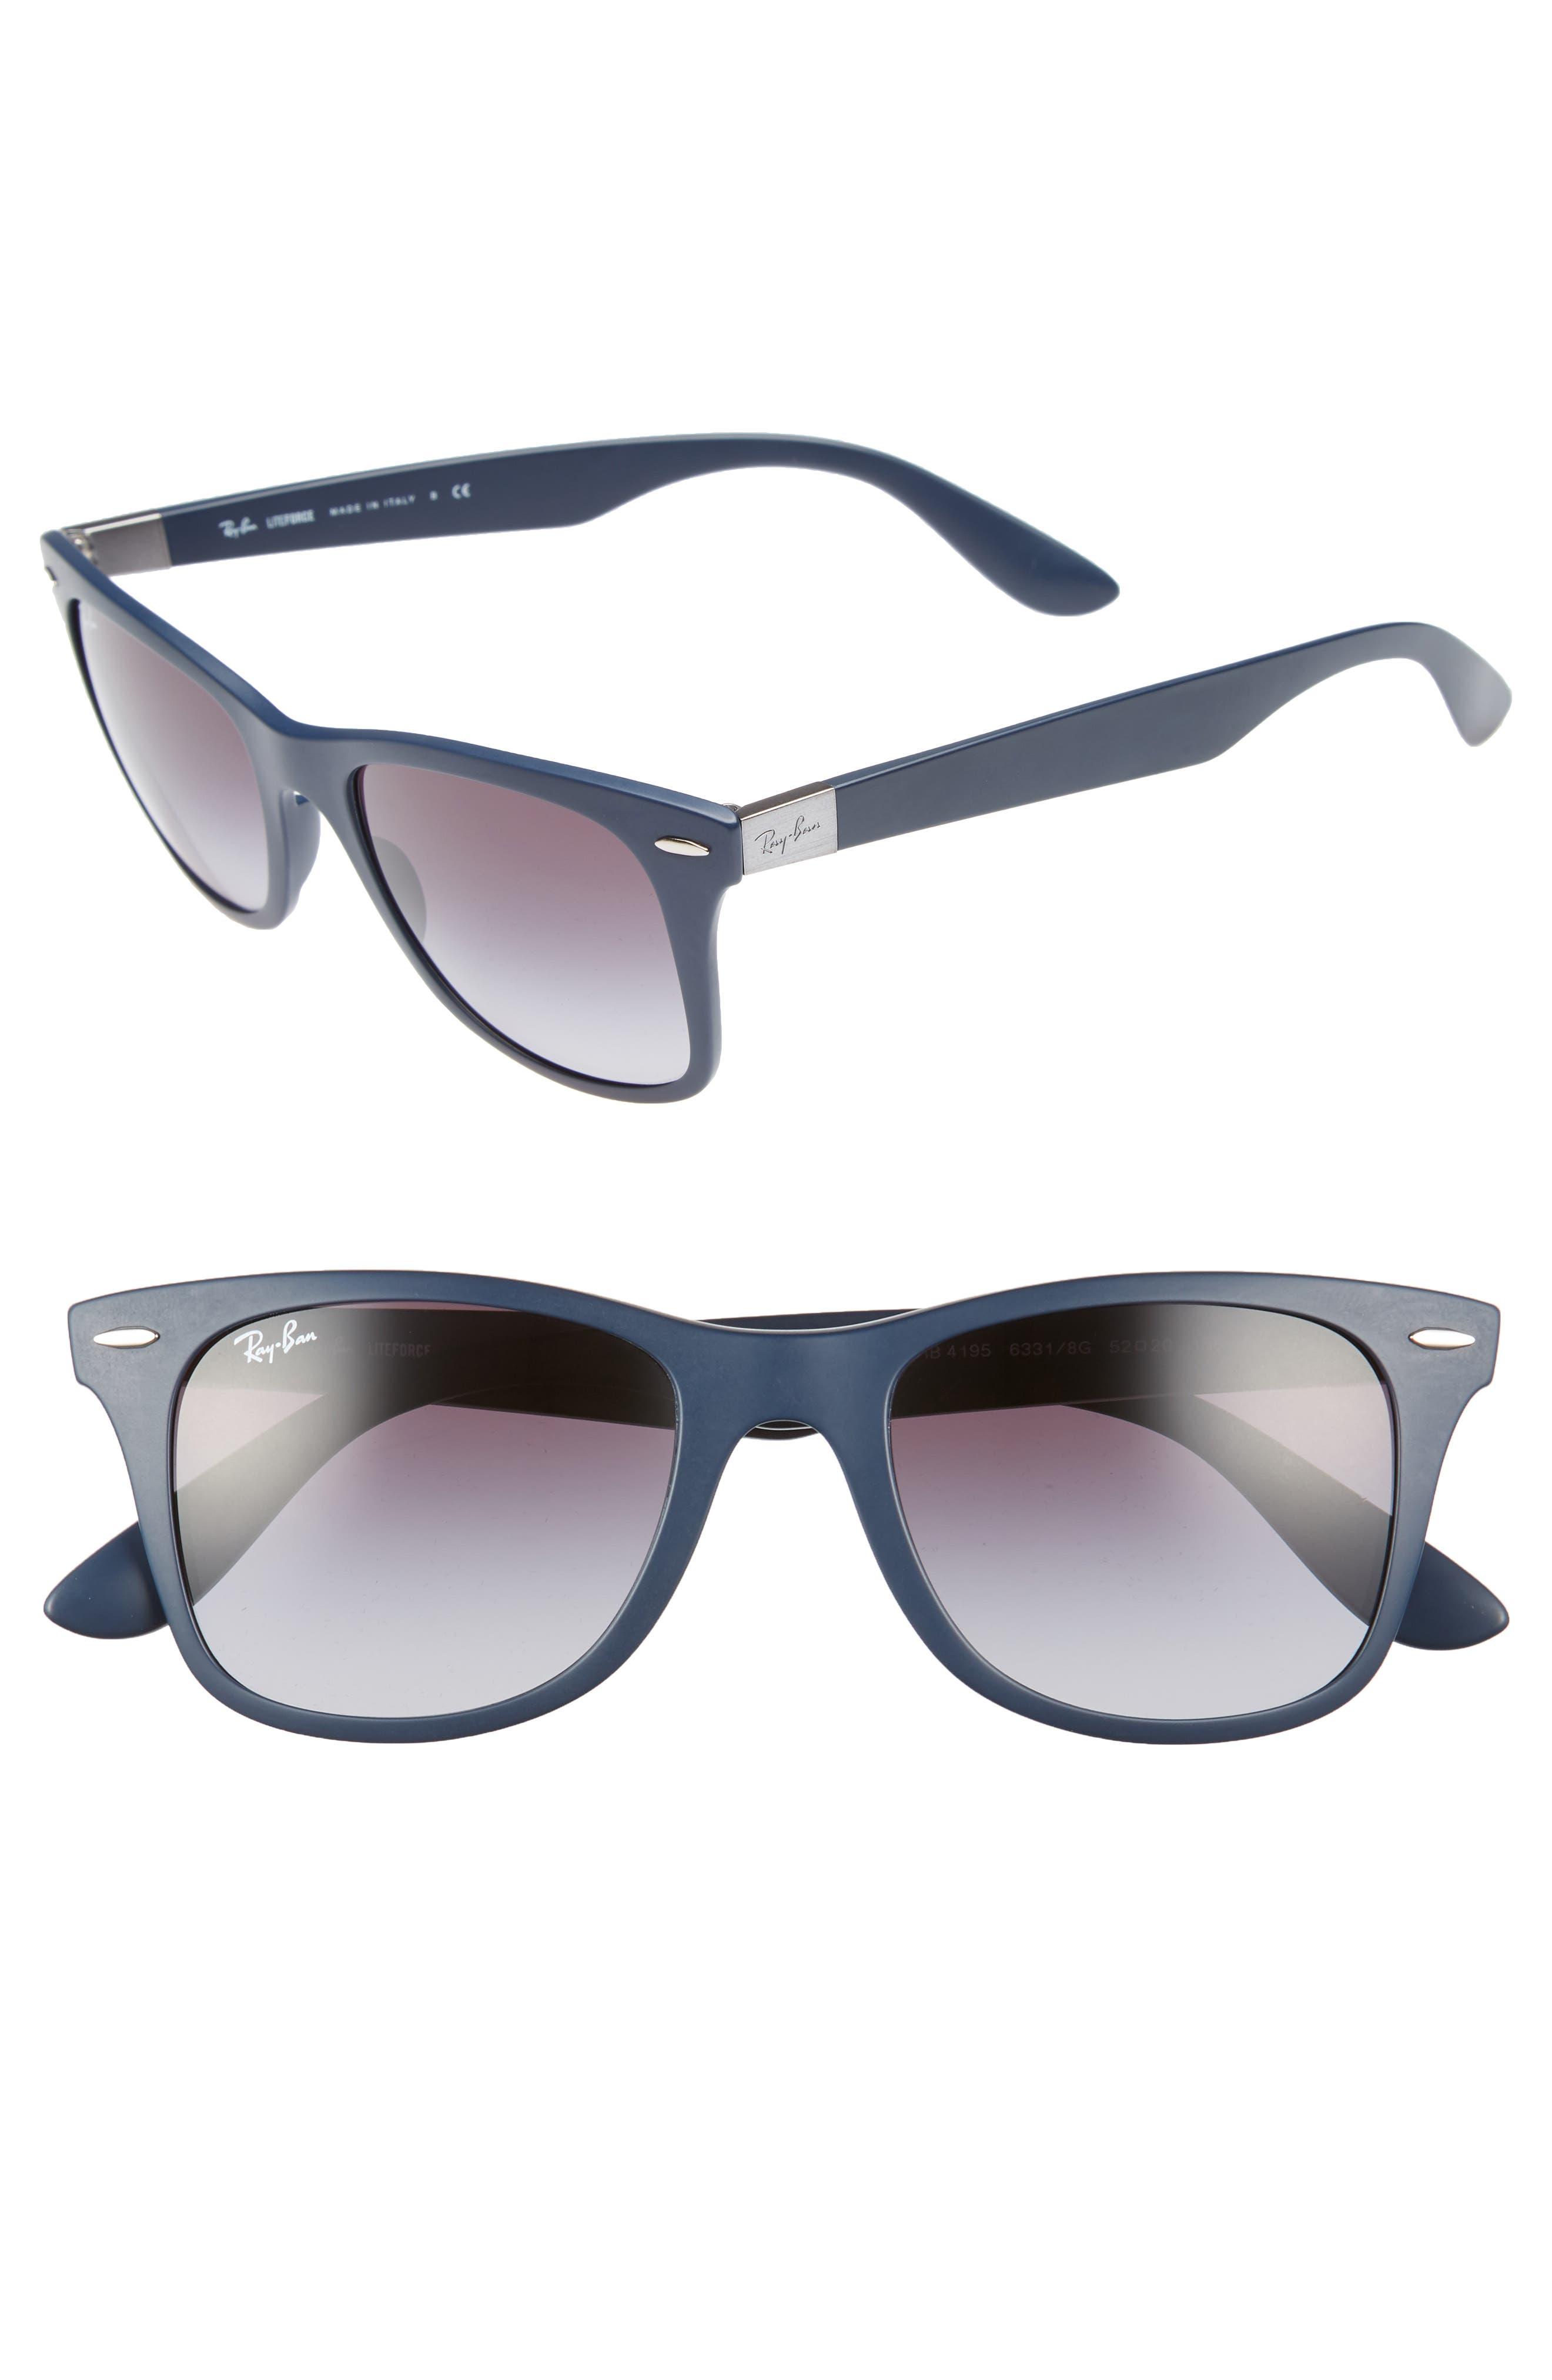 52mm Sunglasses,                             Main thumbnail 1, color,                             Blue/ Grey